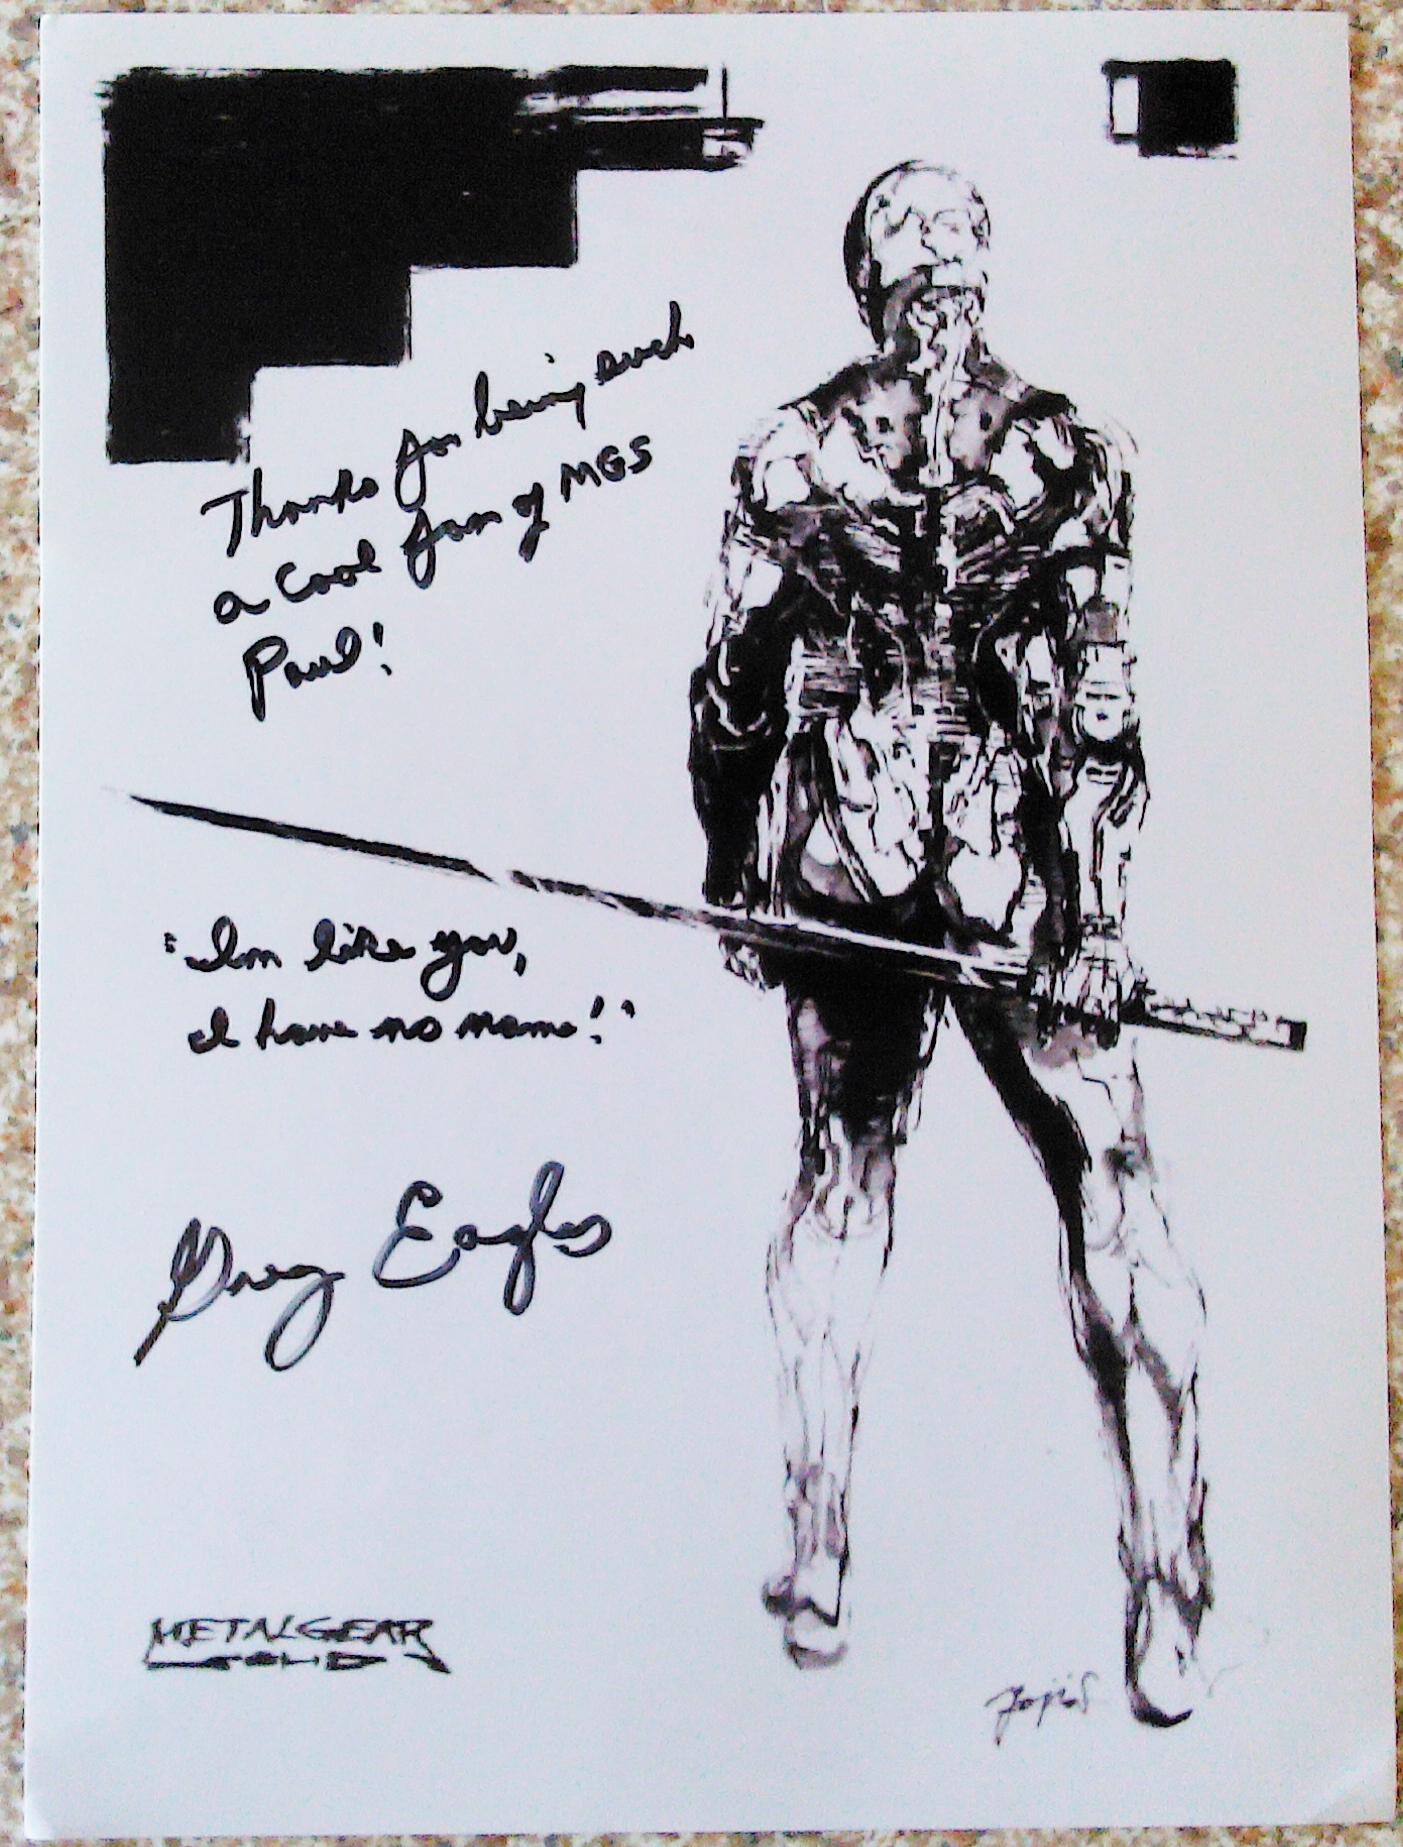 MGS - Greg Eagles